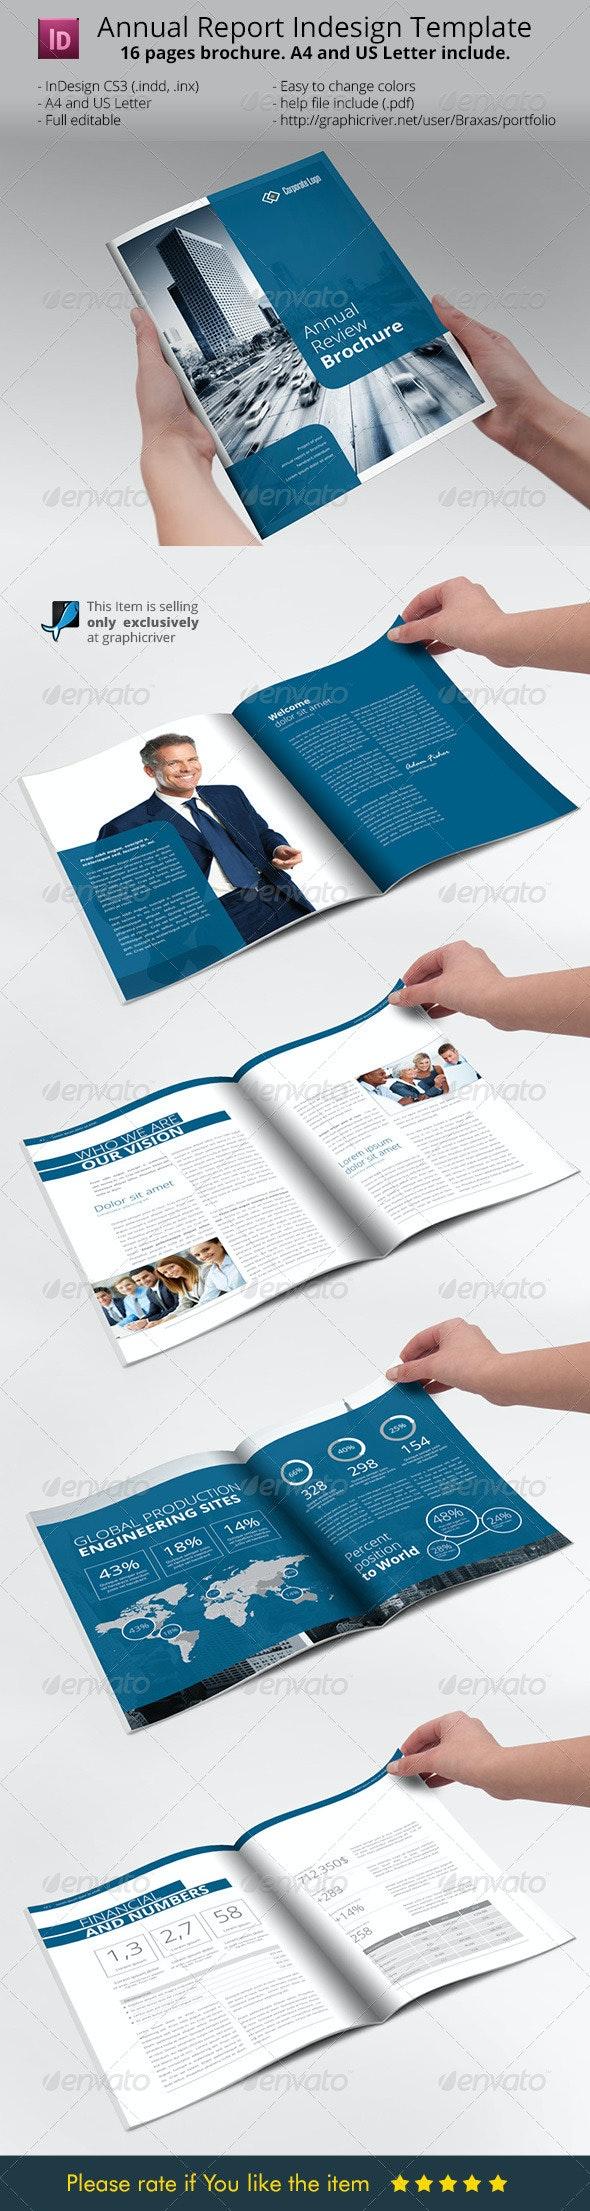 Annual Report Brochure Indesign Template - Informational Brochures